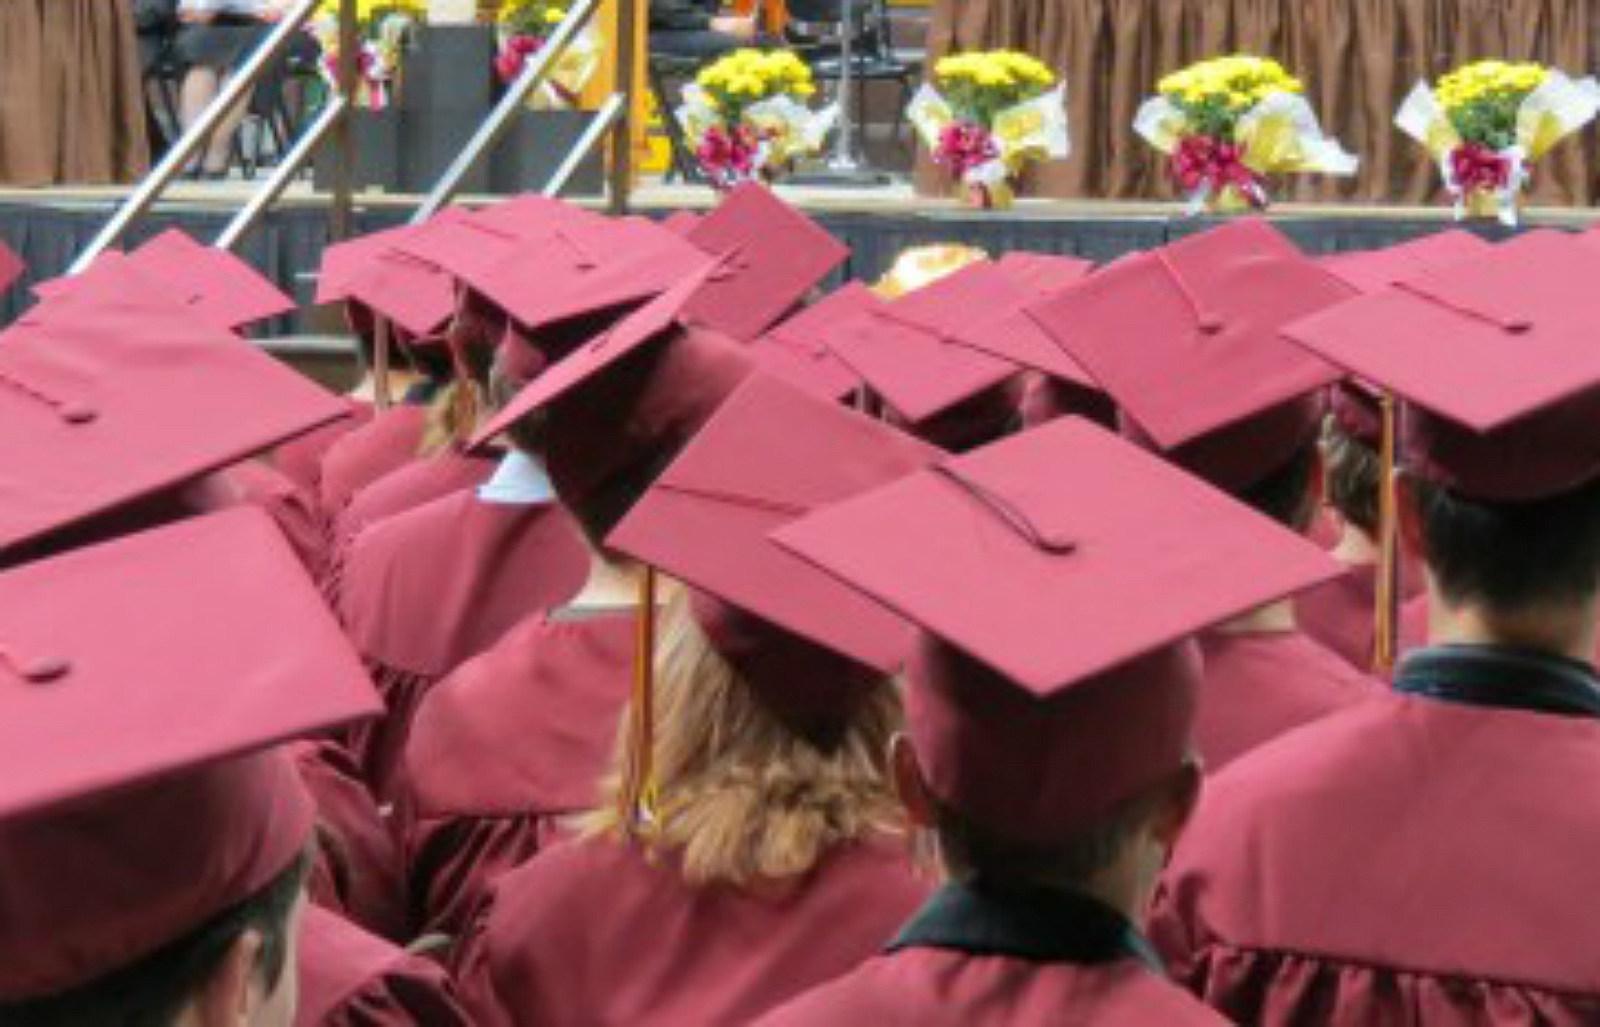 Laramie High School, graduation caps, gowns